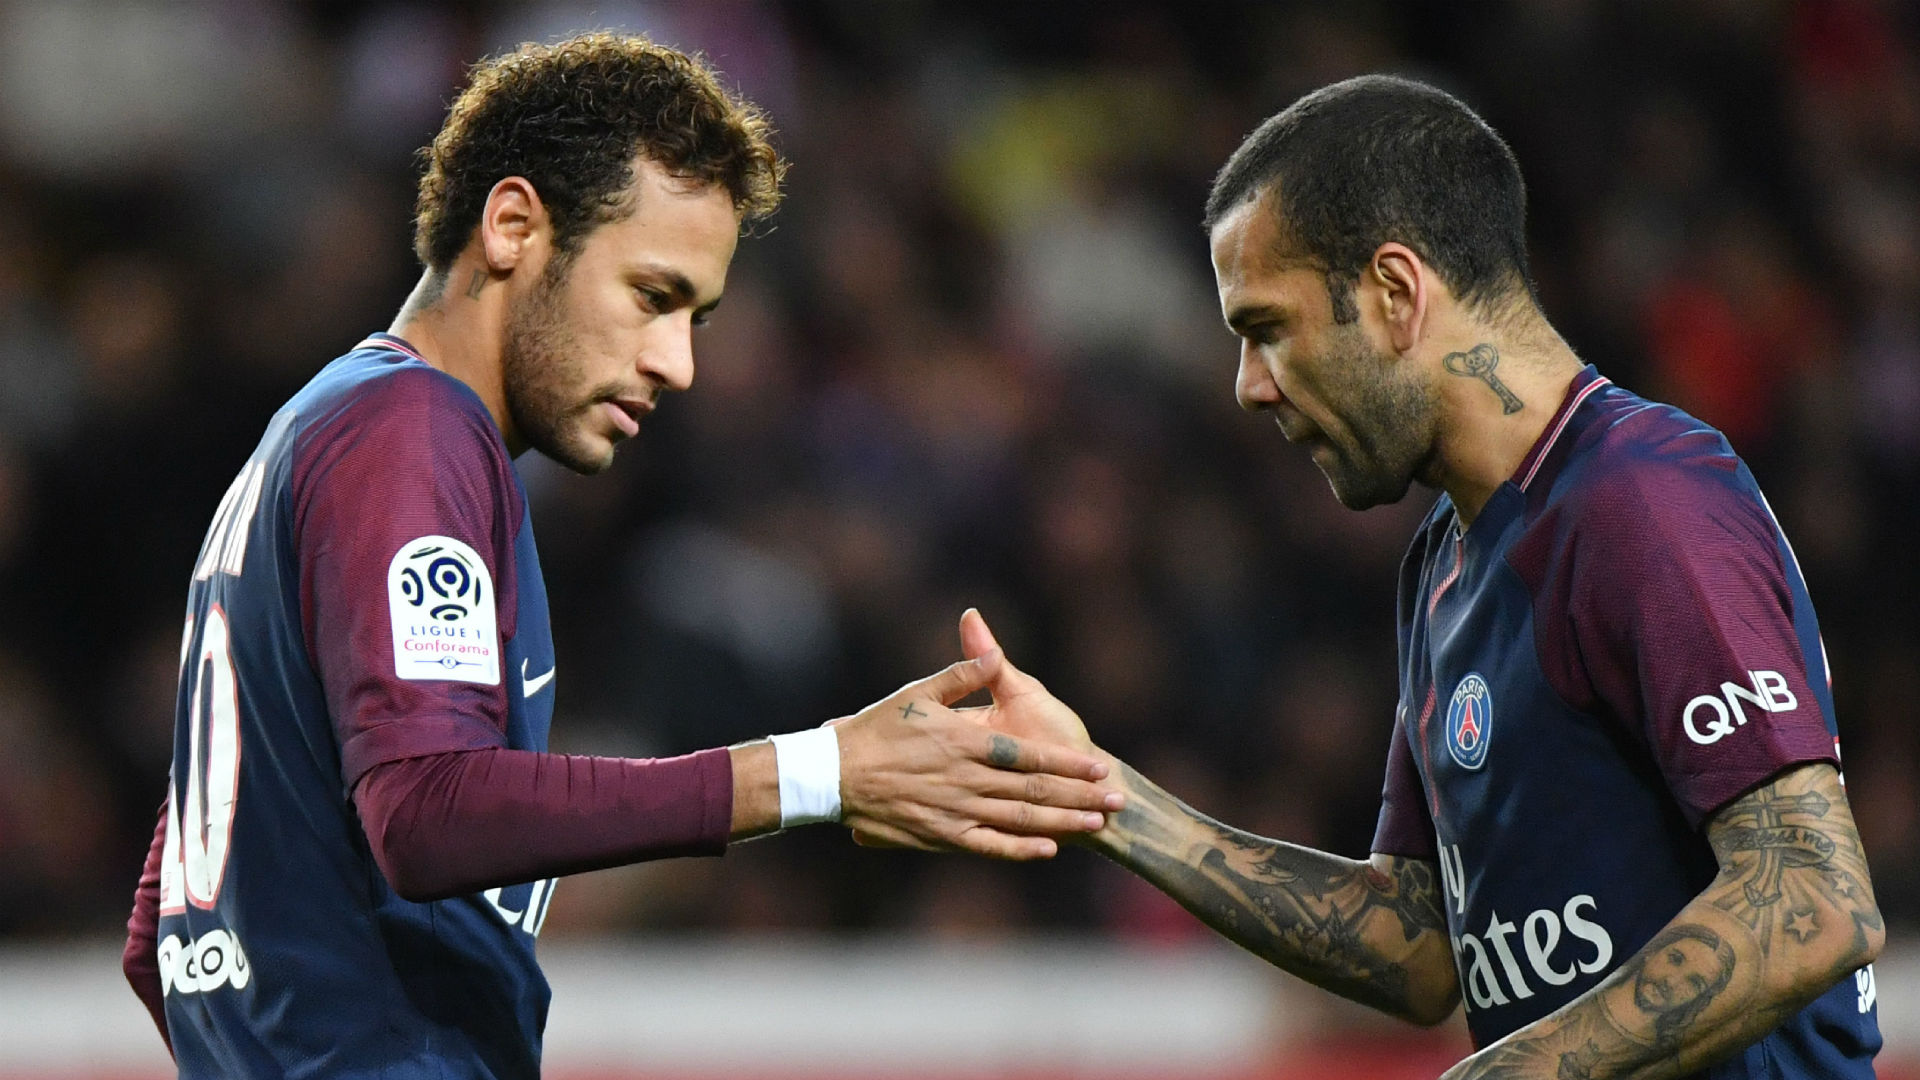 He's like Messi or Ronaldo - Alves backs Neymar in wake of criticism surrounding PSG exit talks